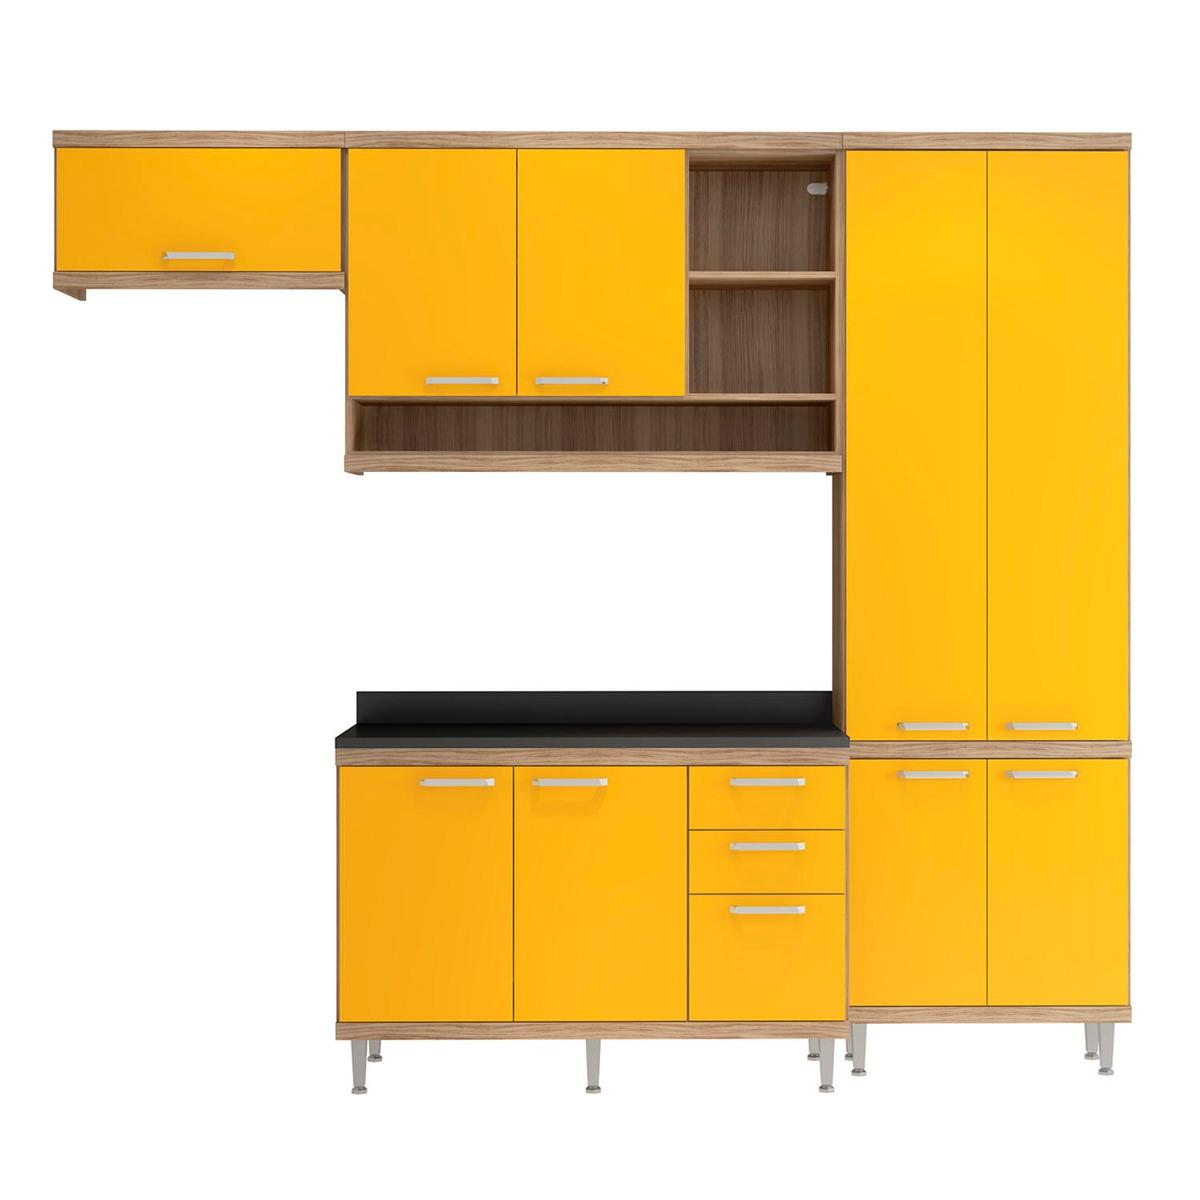 Cozinha Compacta 5143 Sic Lia Multim Veis N O Db R 1 489 90 Em